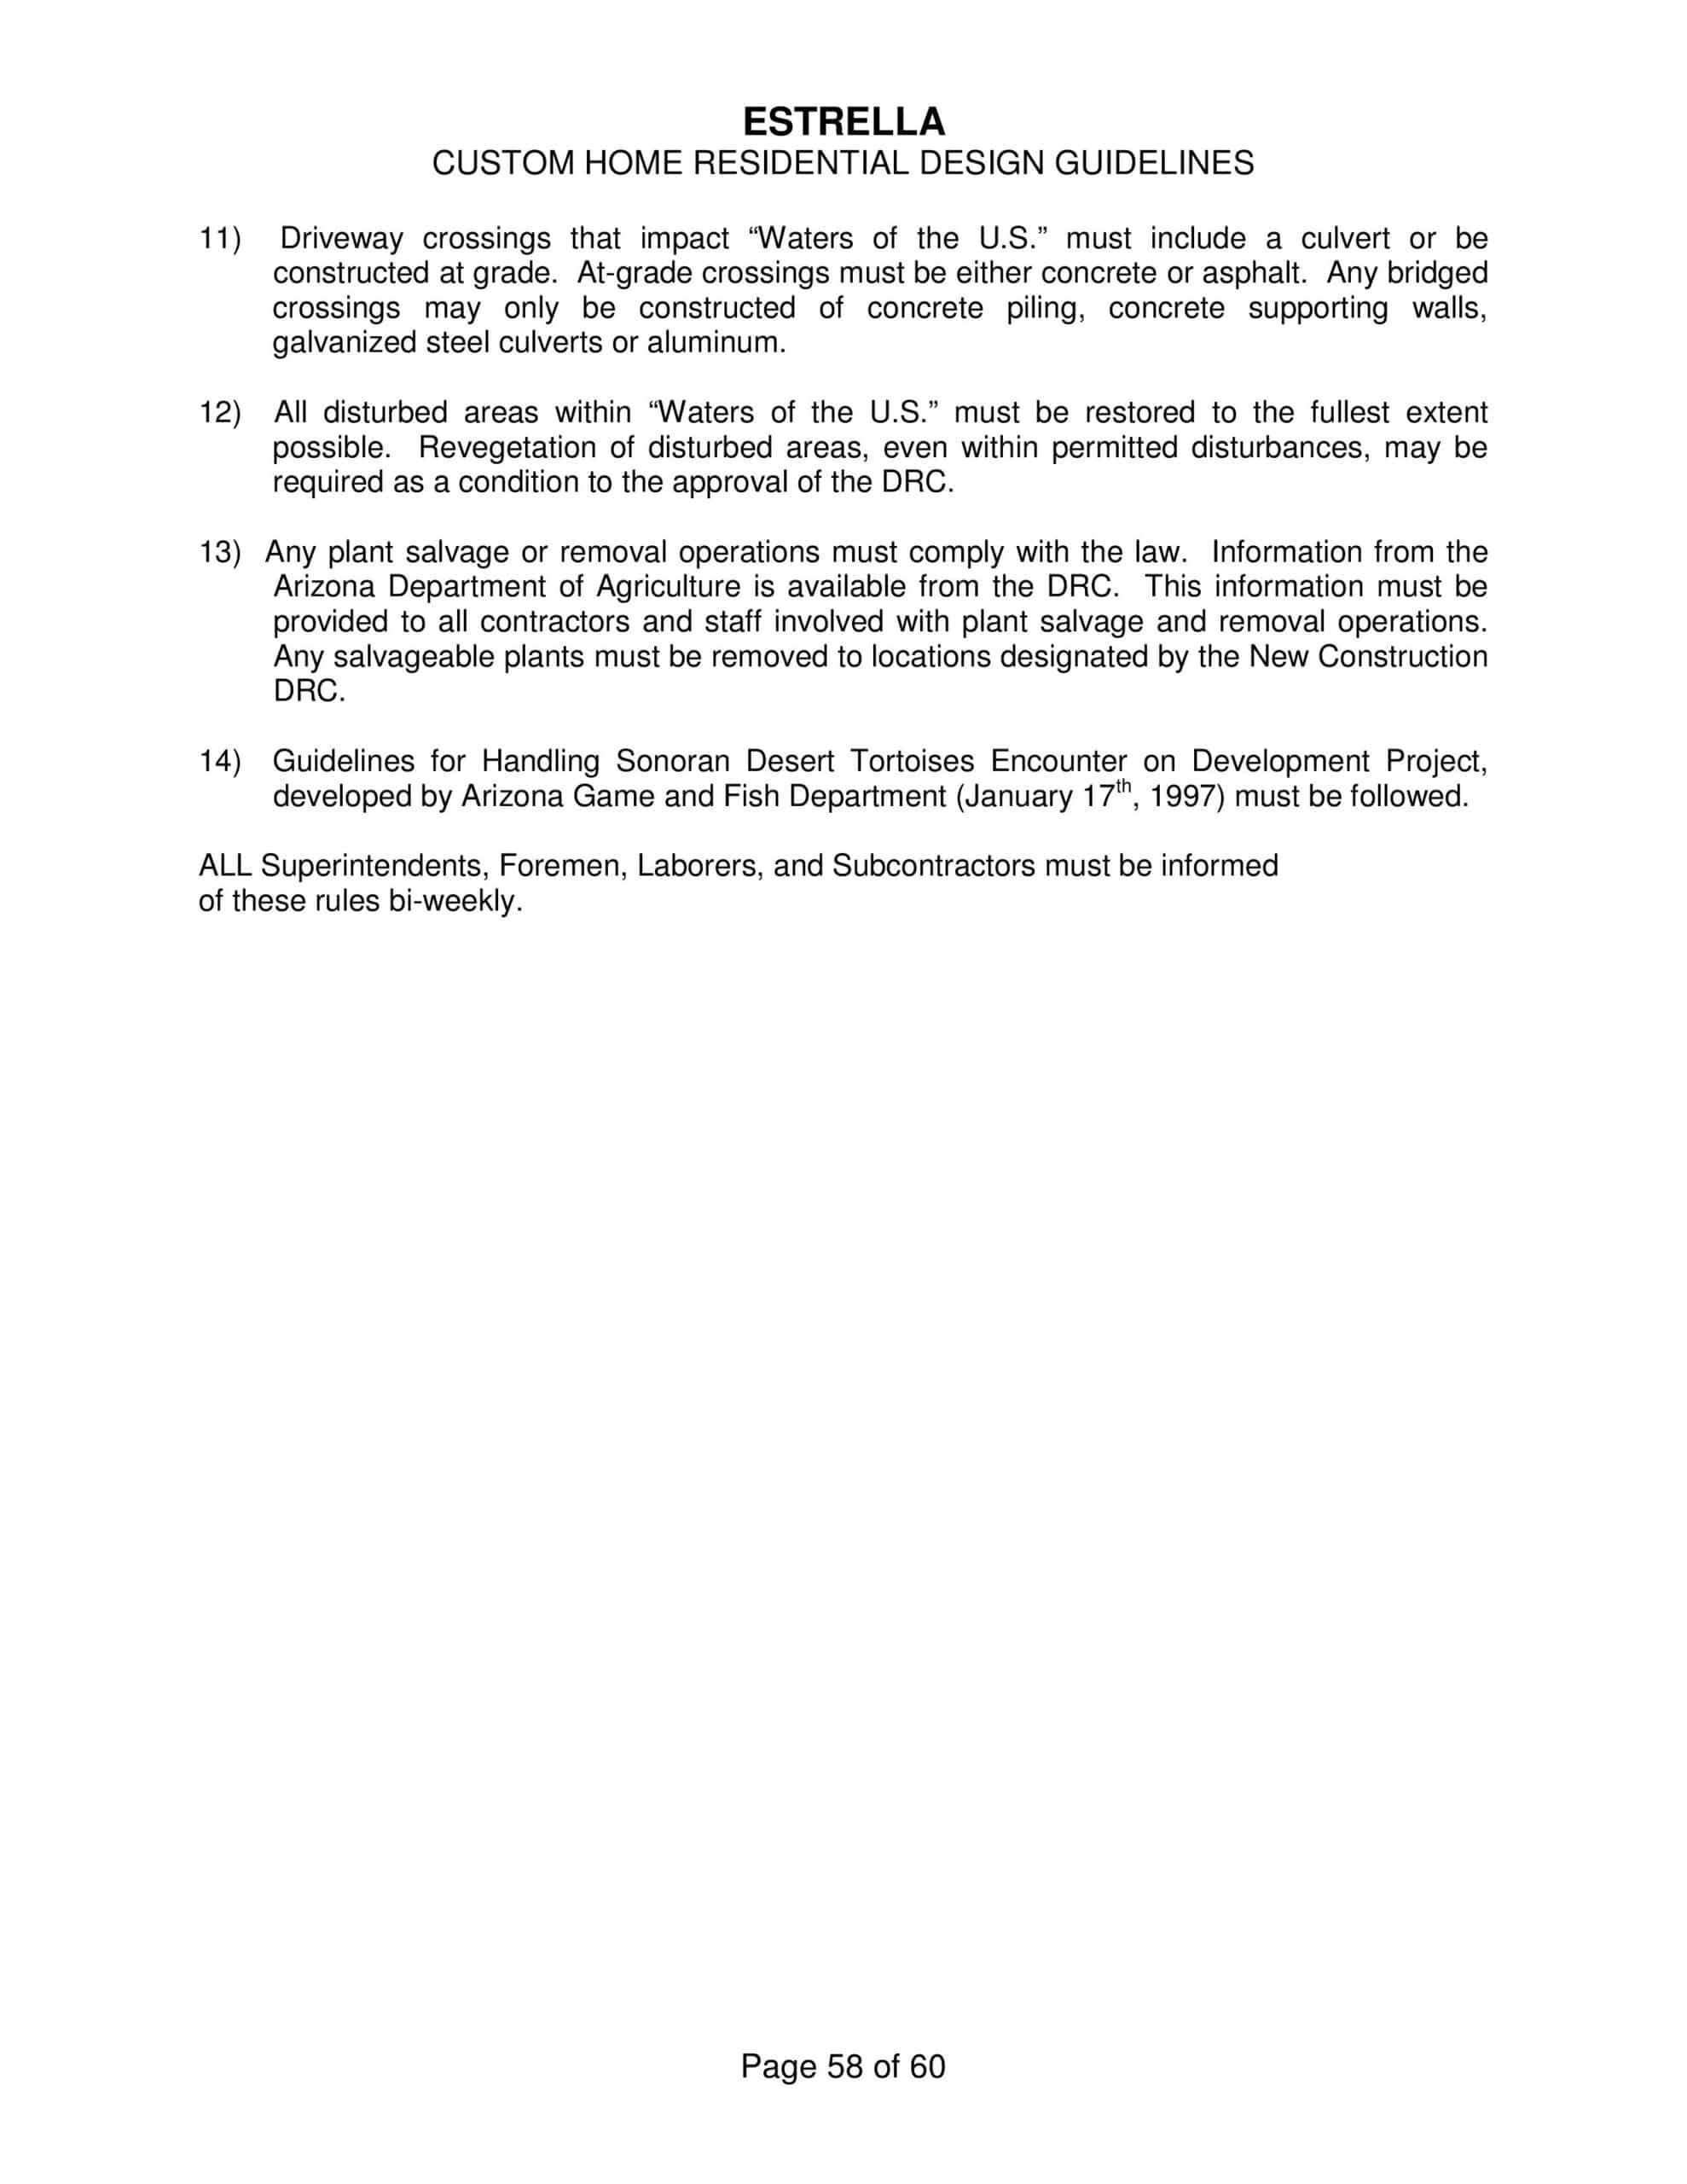 ESTRELLA MOUNTAIN CUSTOM HOME GUIDELINES-page-062